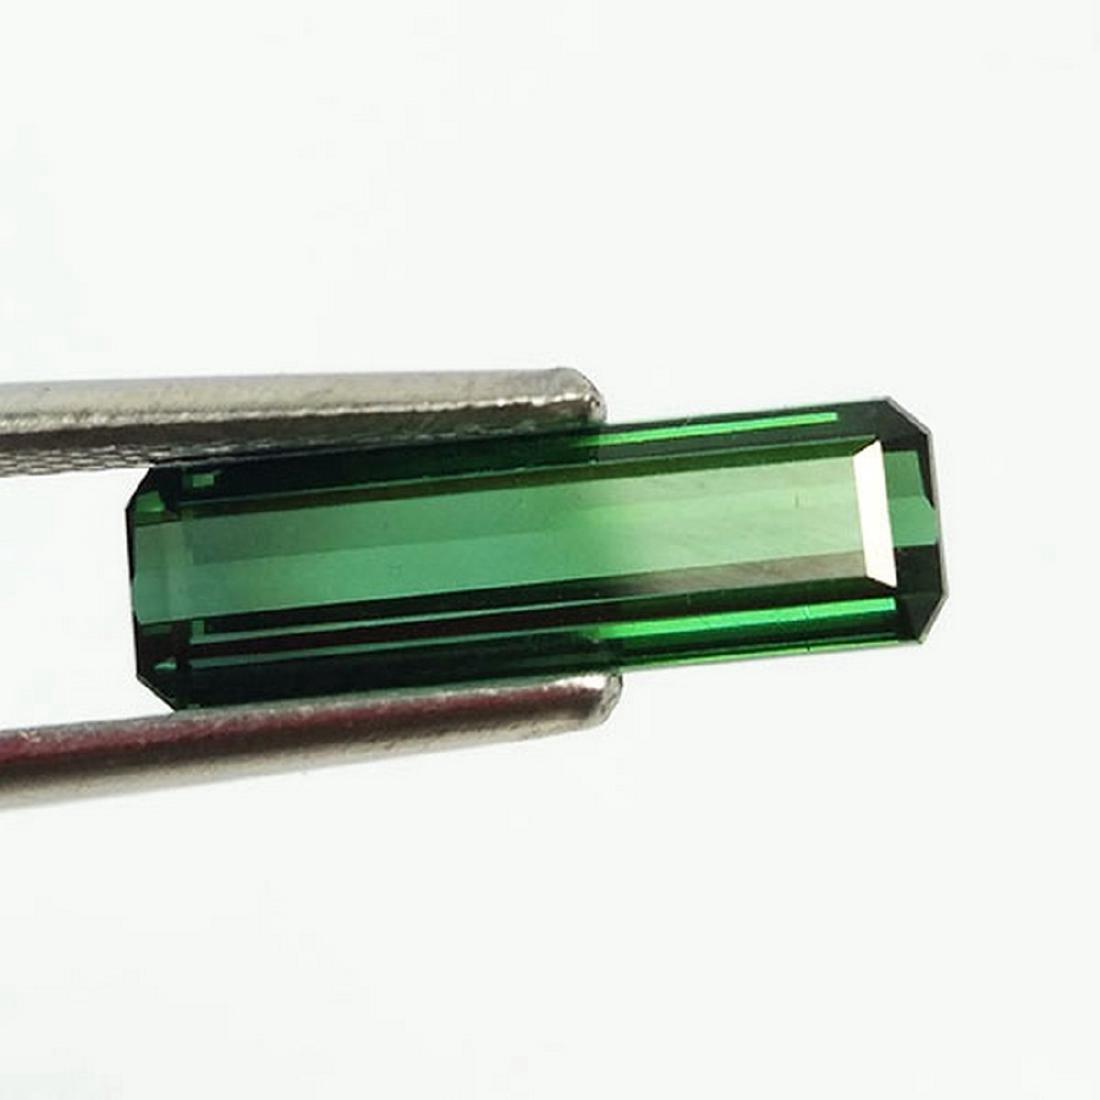 2.05 Carat Loose Green Mozombique Tourmaline - 3